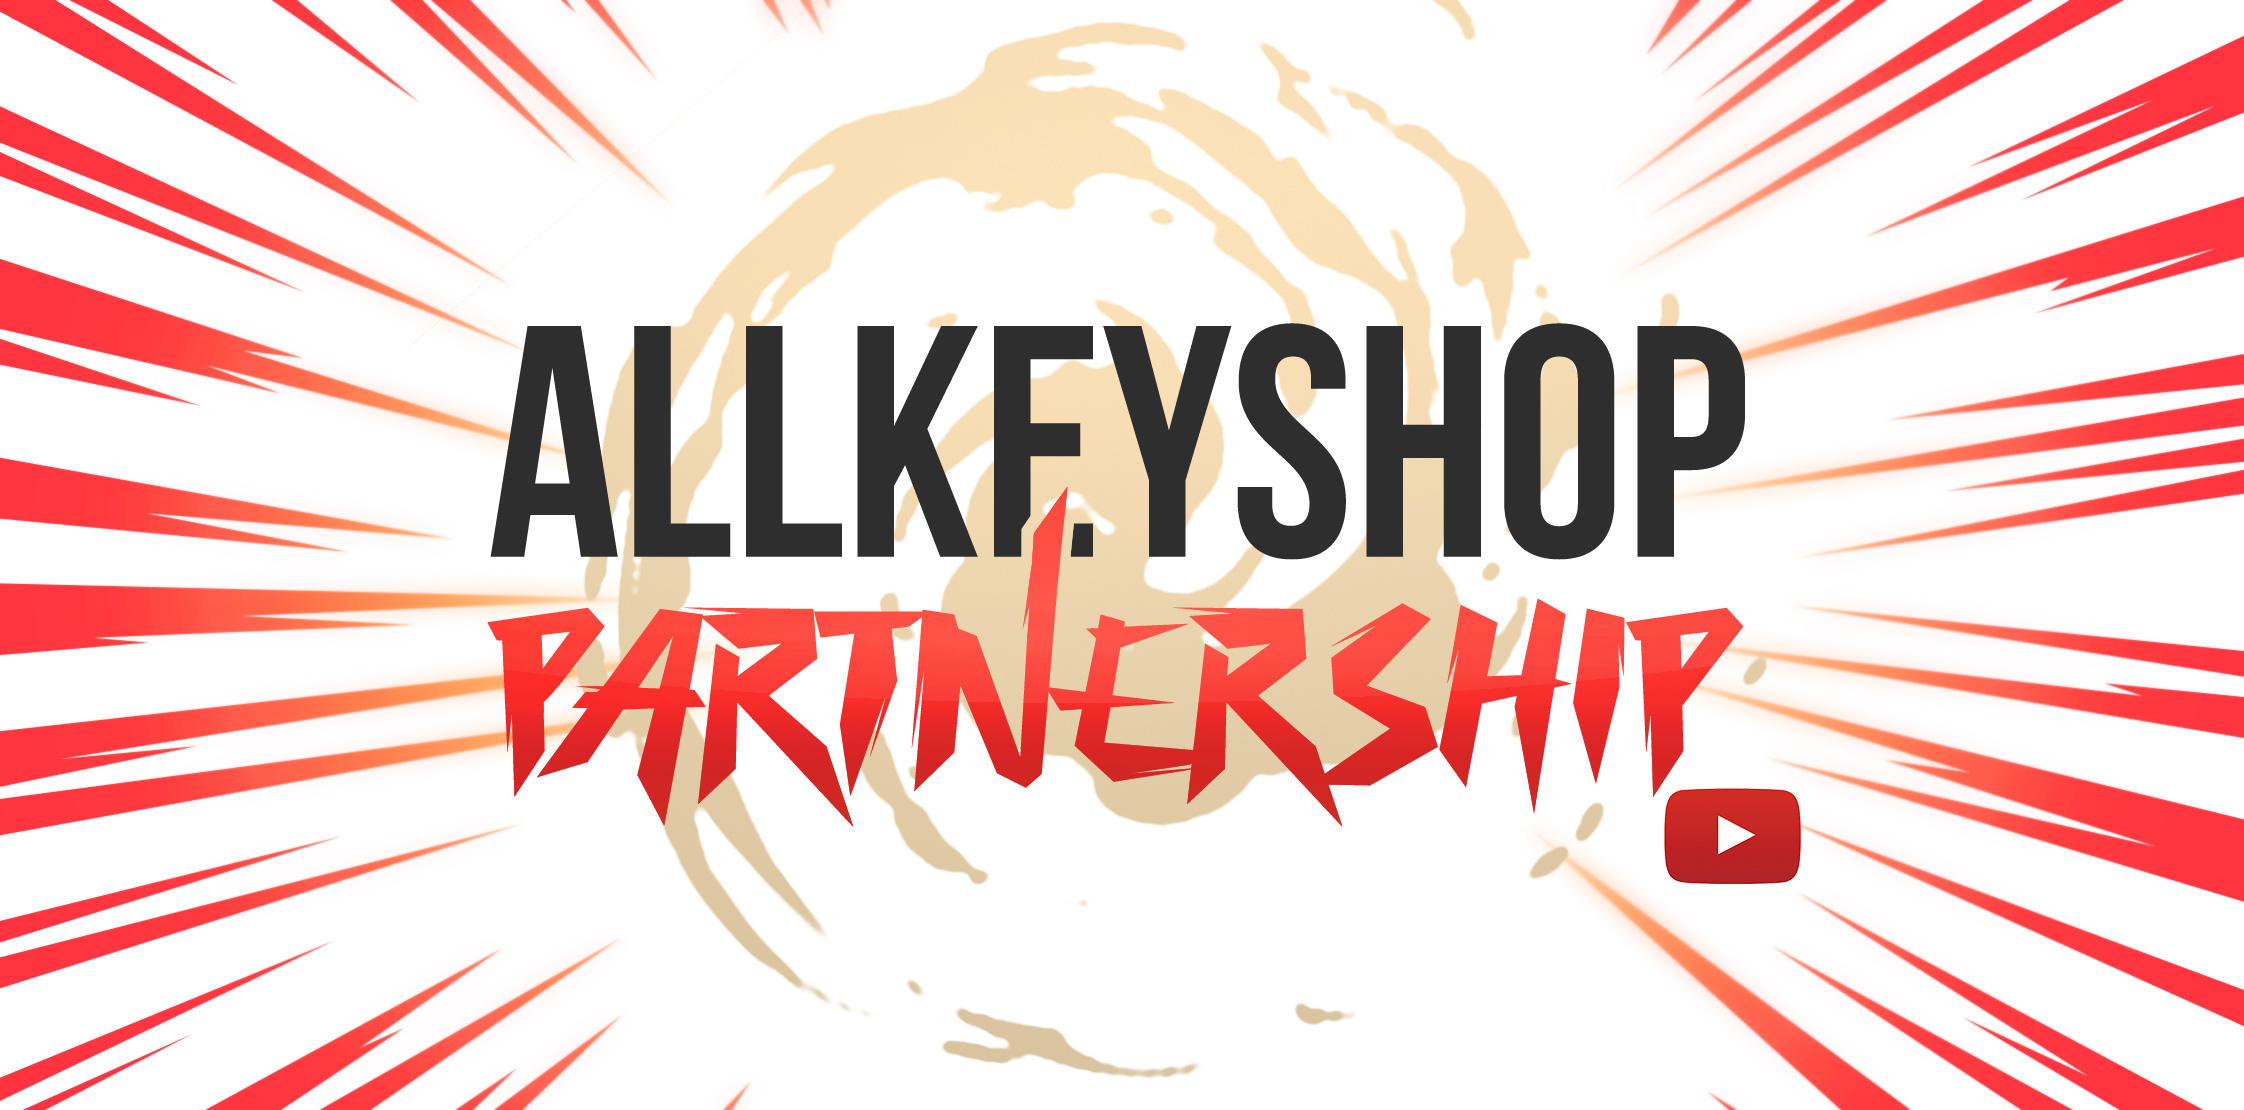 Allkeyshop Youtube Partnership